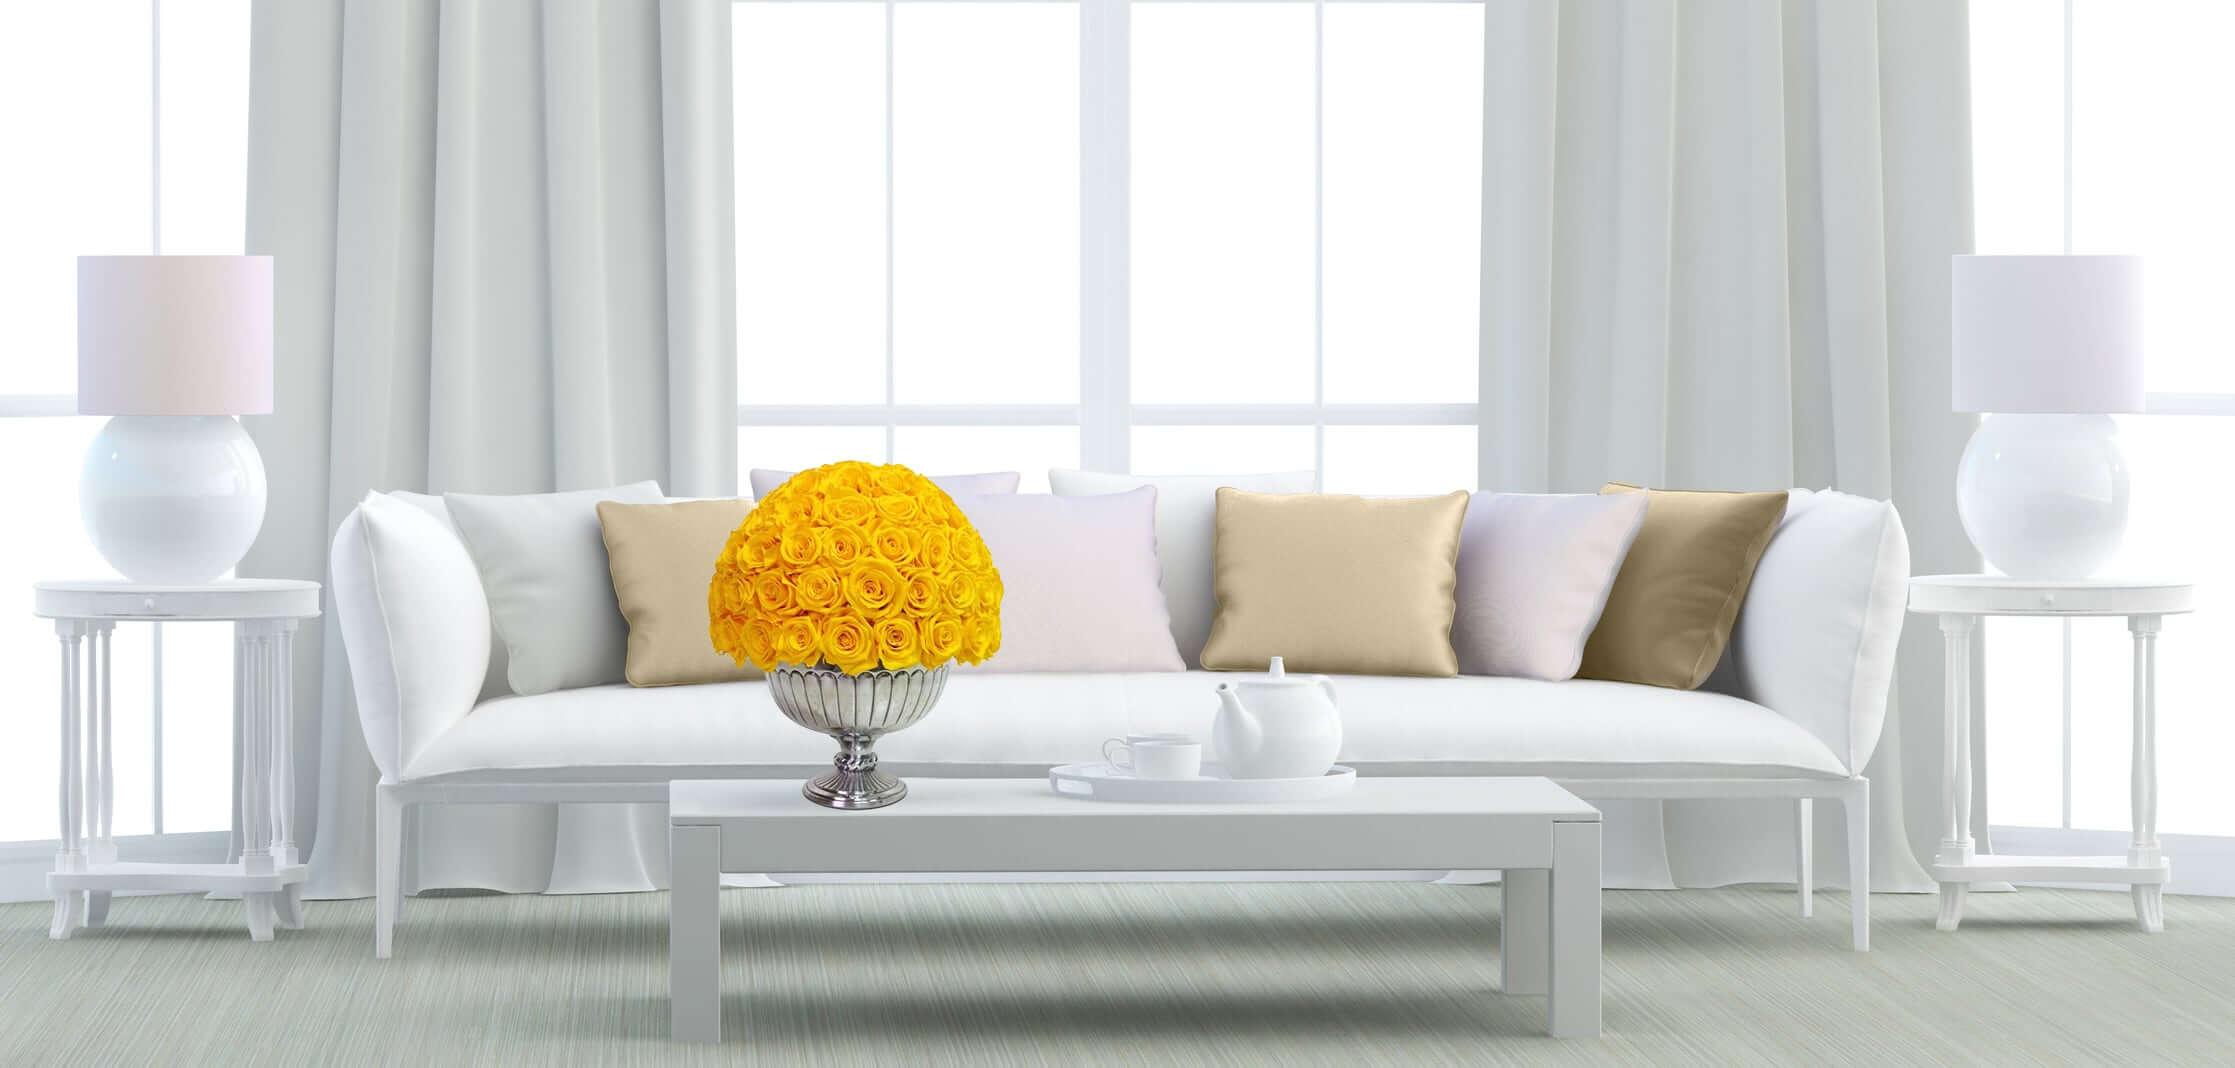 Heinau Yellow Roses Floral Arrangement on Table Interior